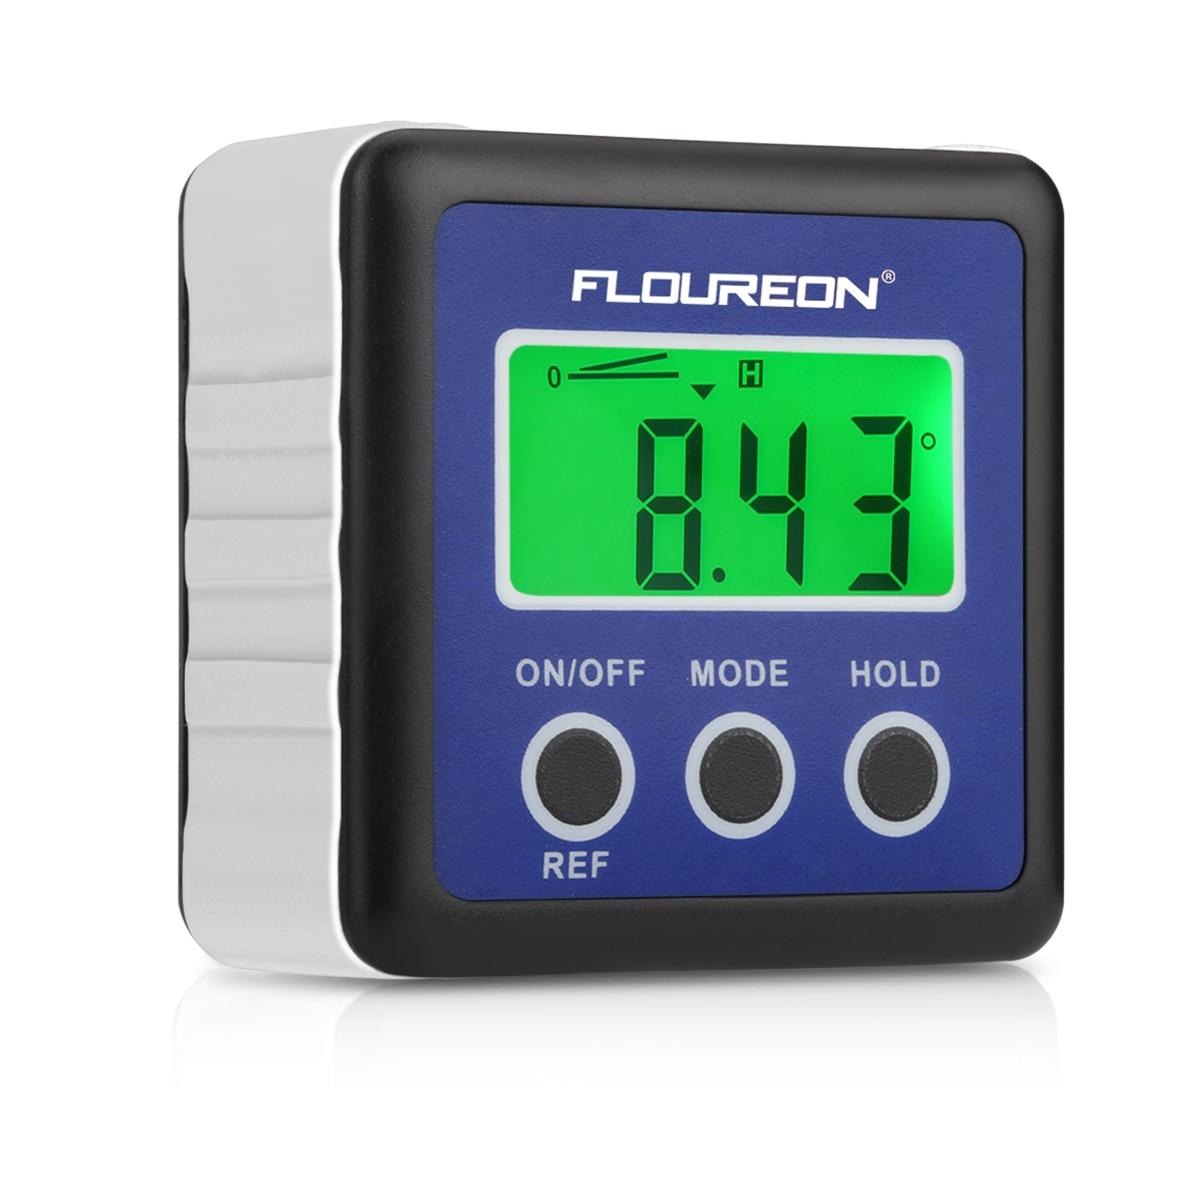 Digital Protractor Inclinometer Level Box Waterproof Angle Finder Measure Bevel Box Goniometer Magnet 90 Degrees Gauge Ruler